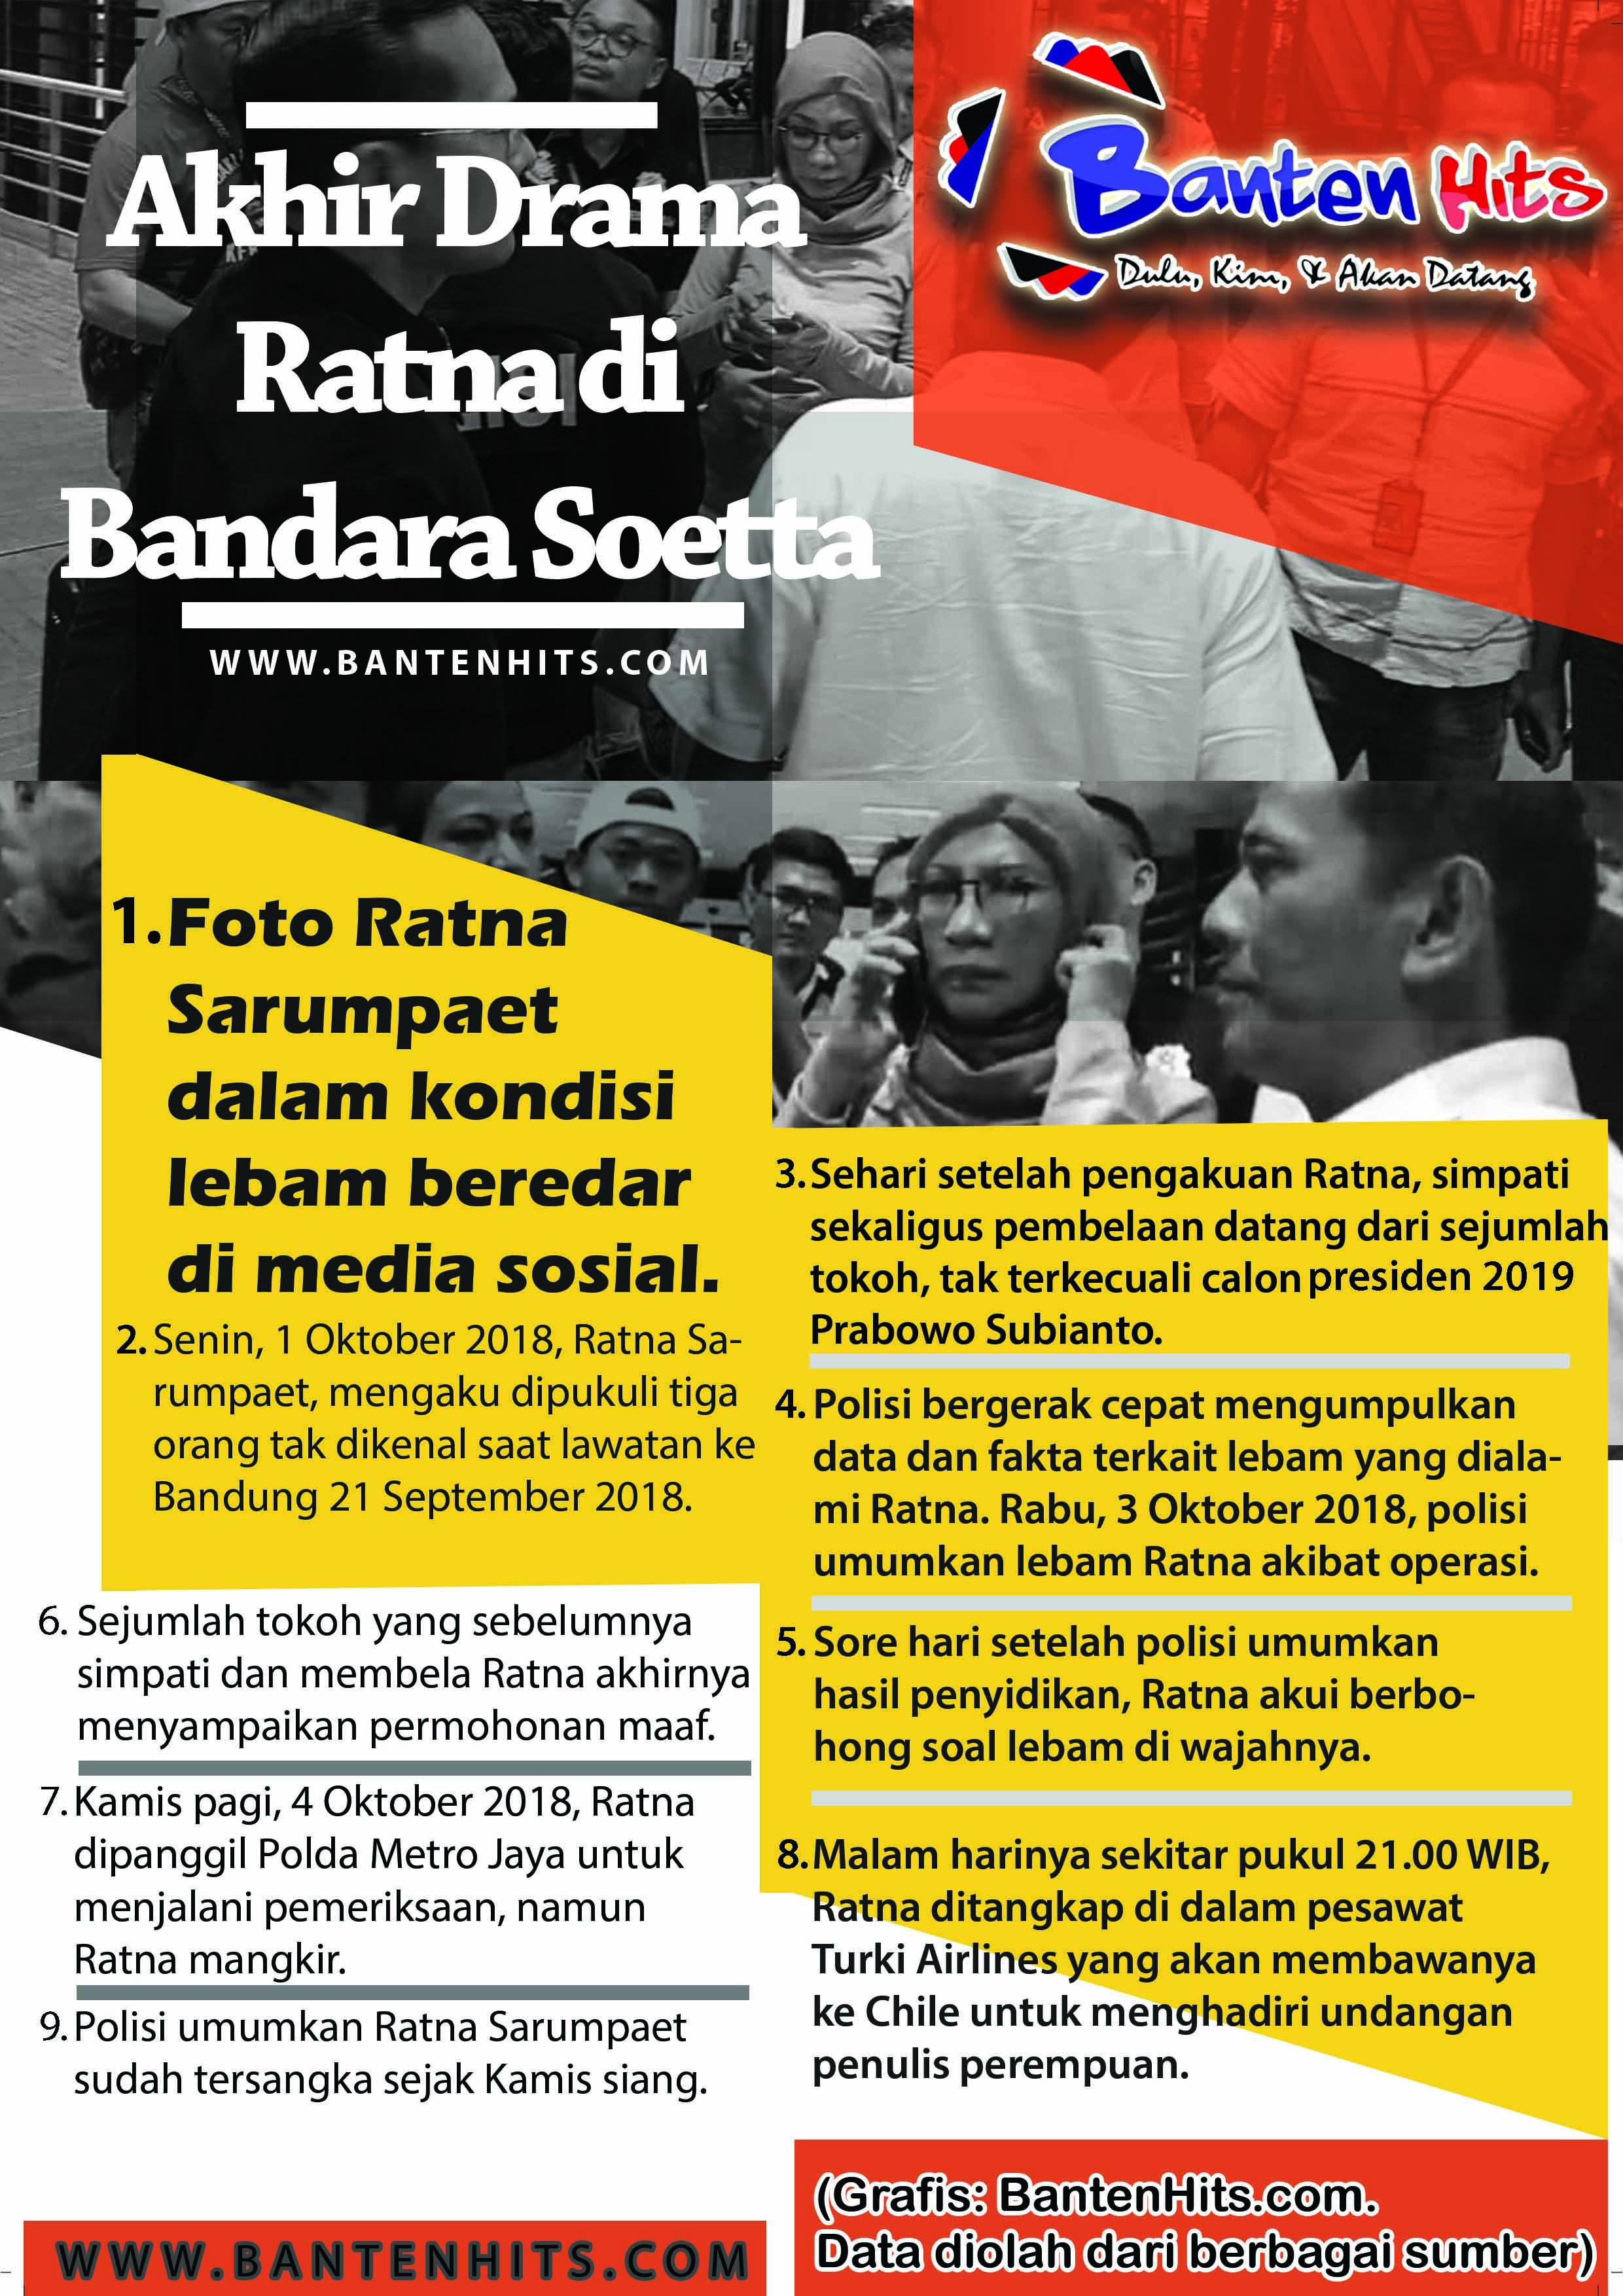 AKHIR DRAMA RATNA DI BANDARA SOETA (1) copy